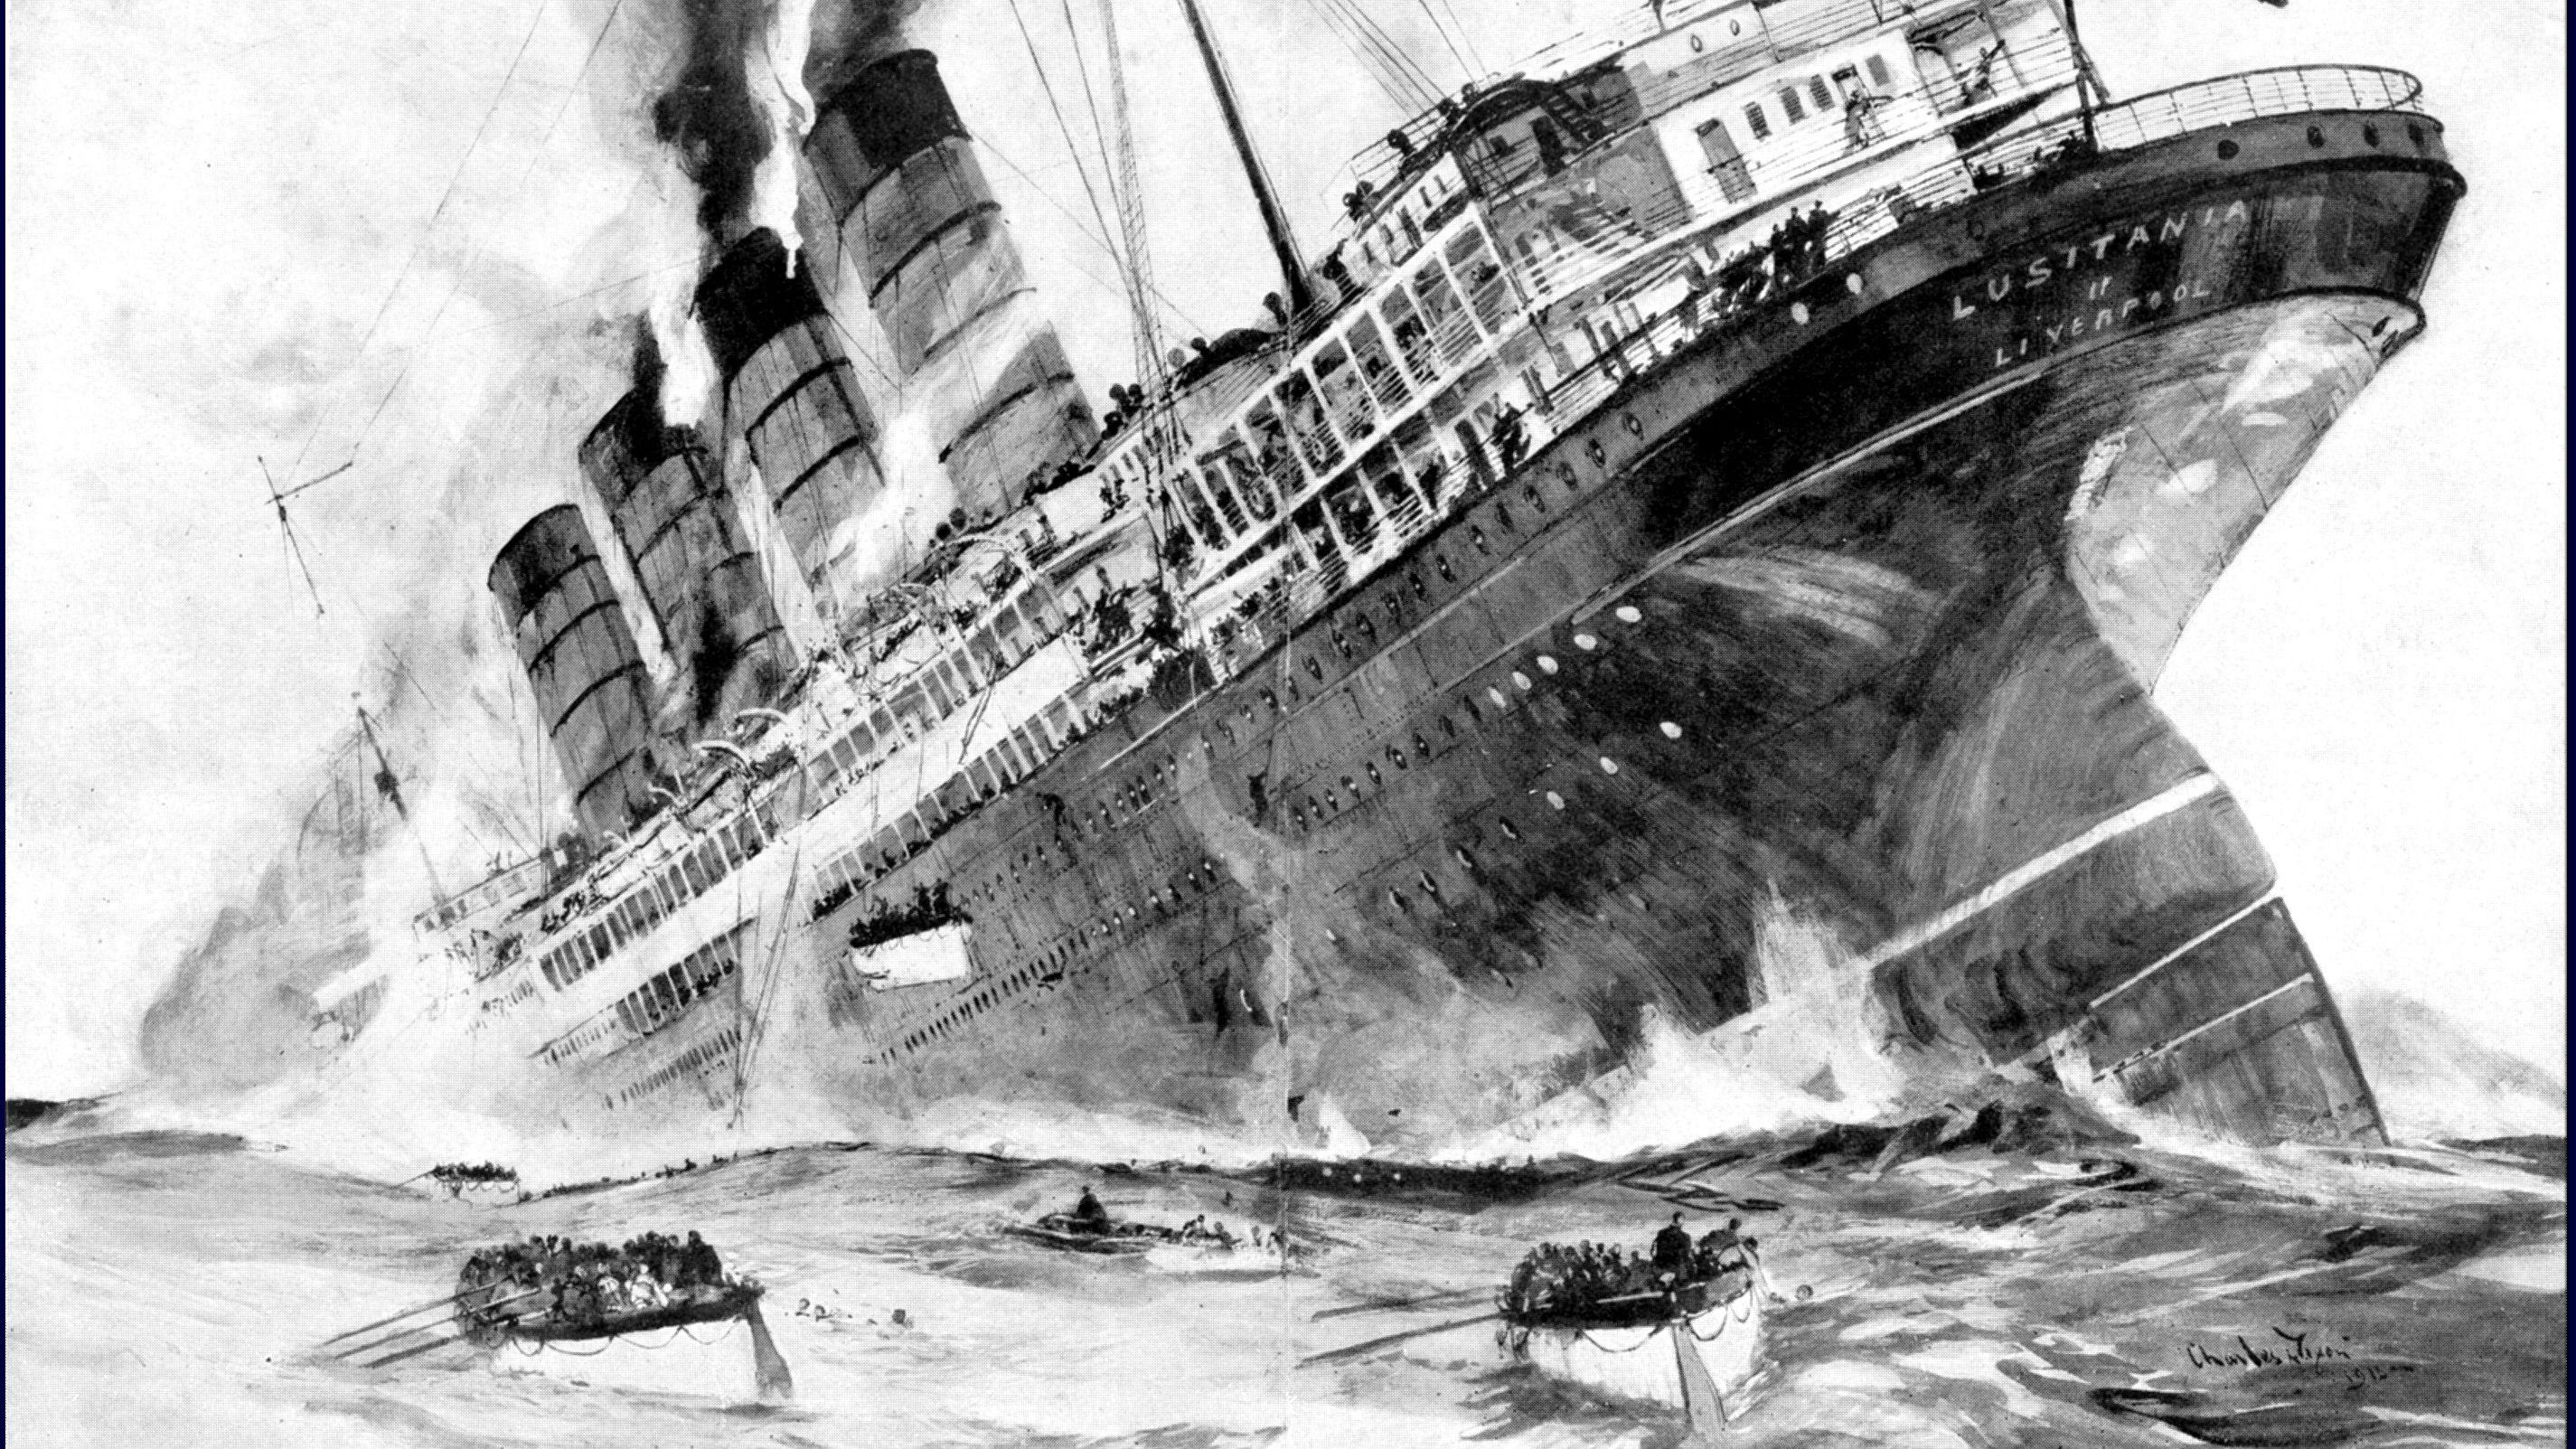 RMS Lusitania PHOTO Ship Sunk by German Submarine World War I